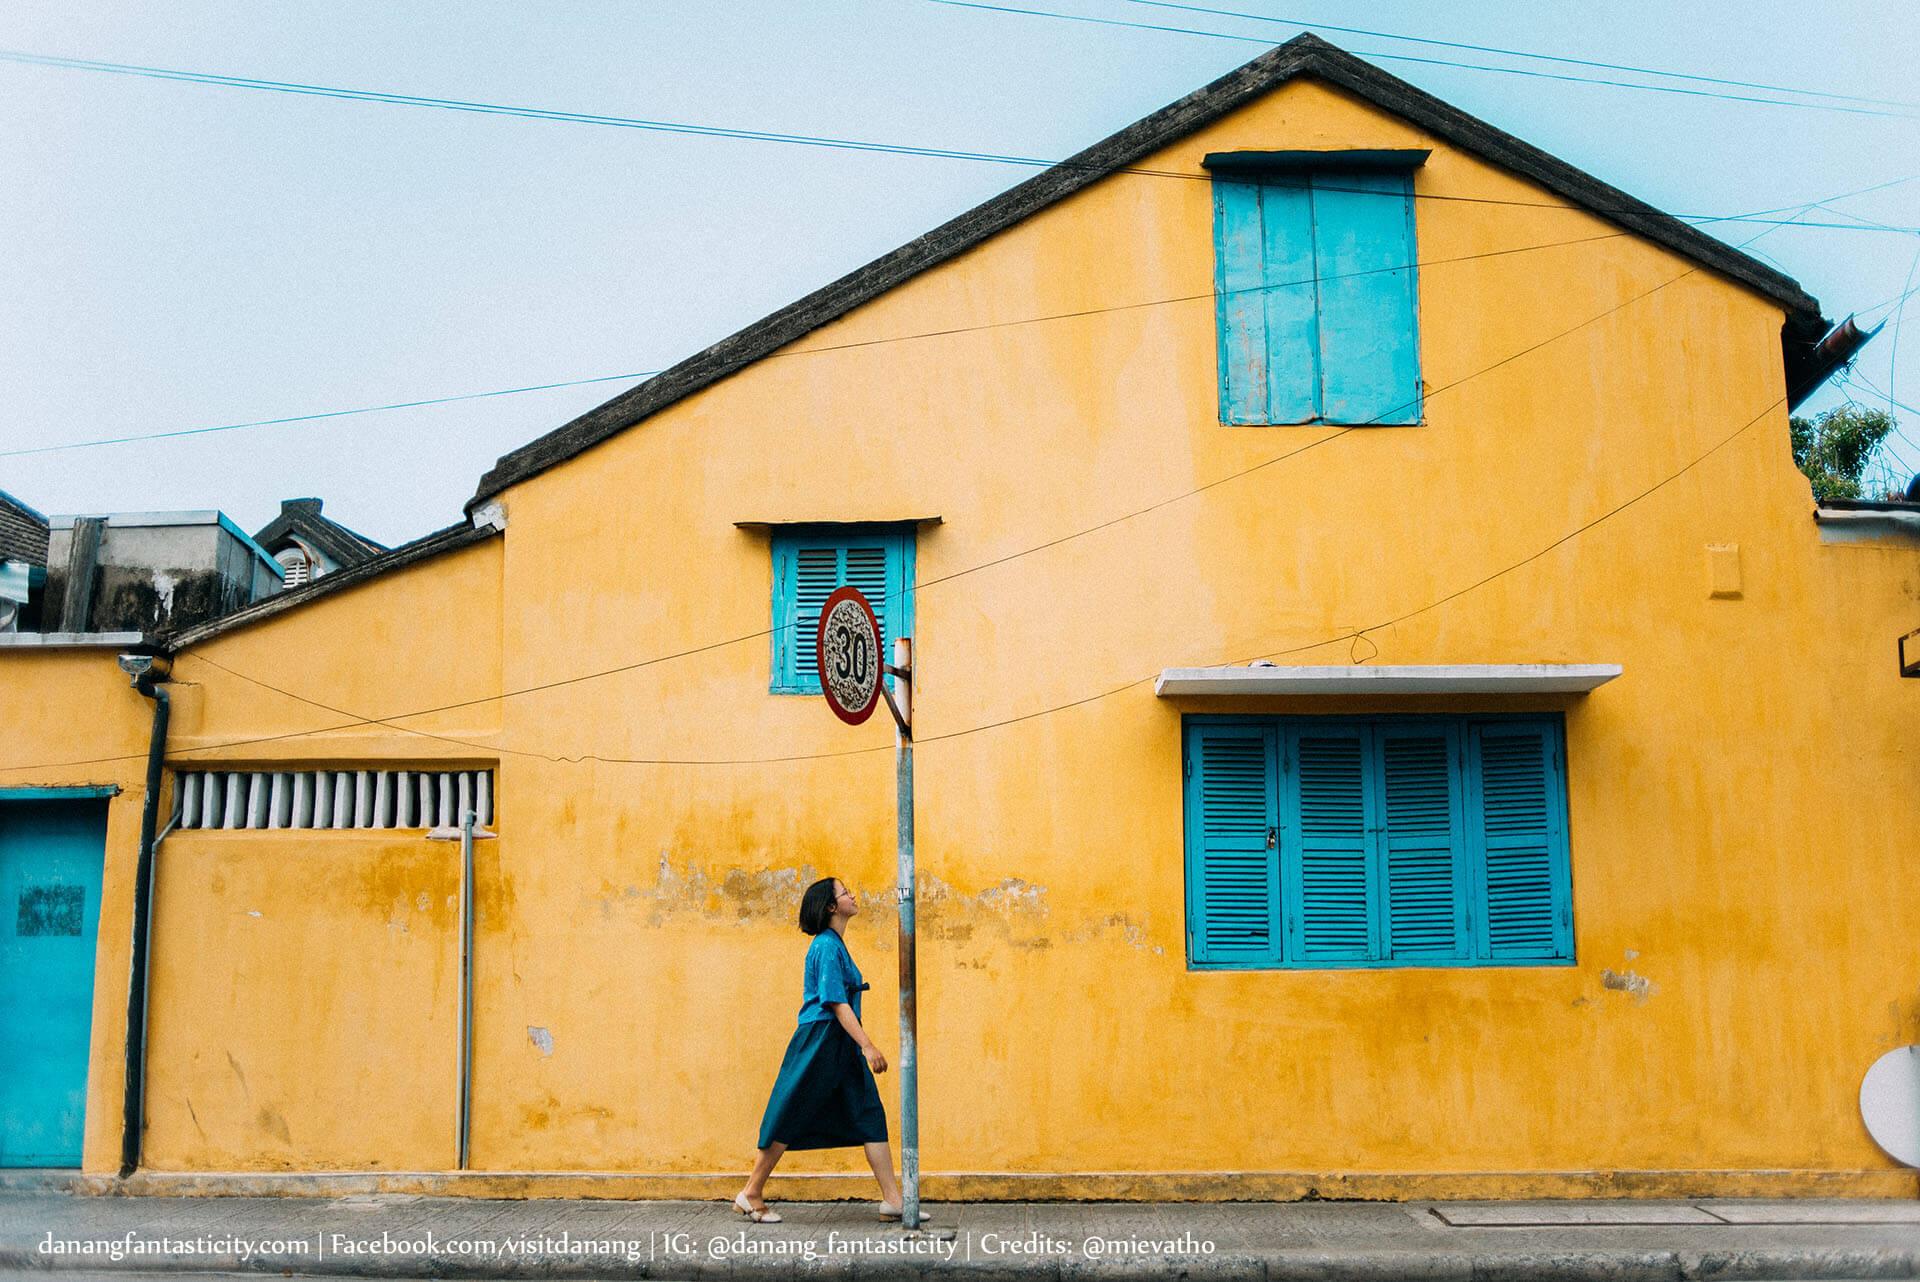 Da Nang Hoi An Anh Cho Minh Tren Chiec Xe Giac Mo Mievatho Danang Fantasticity Com 09